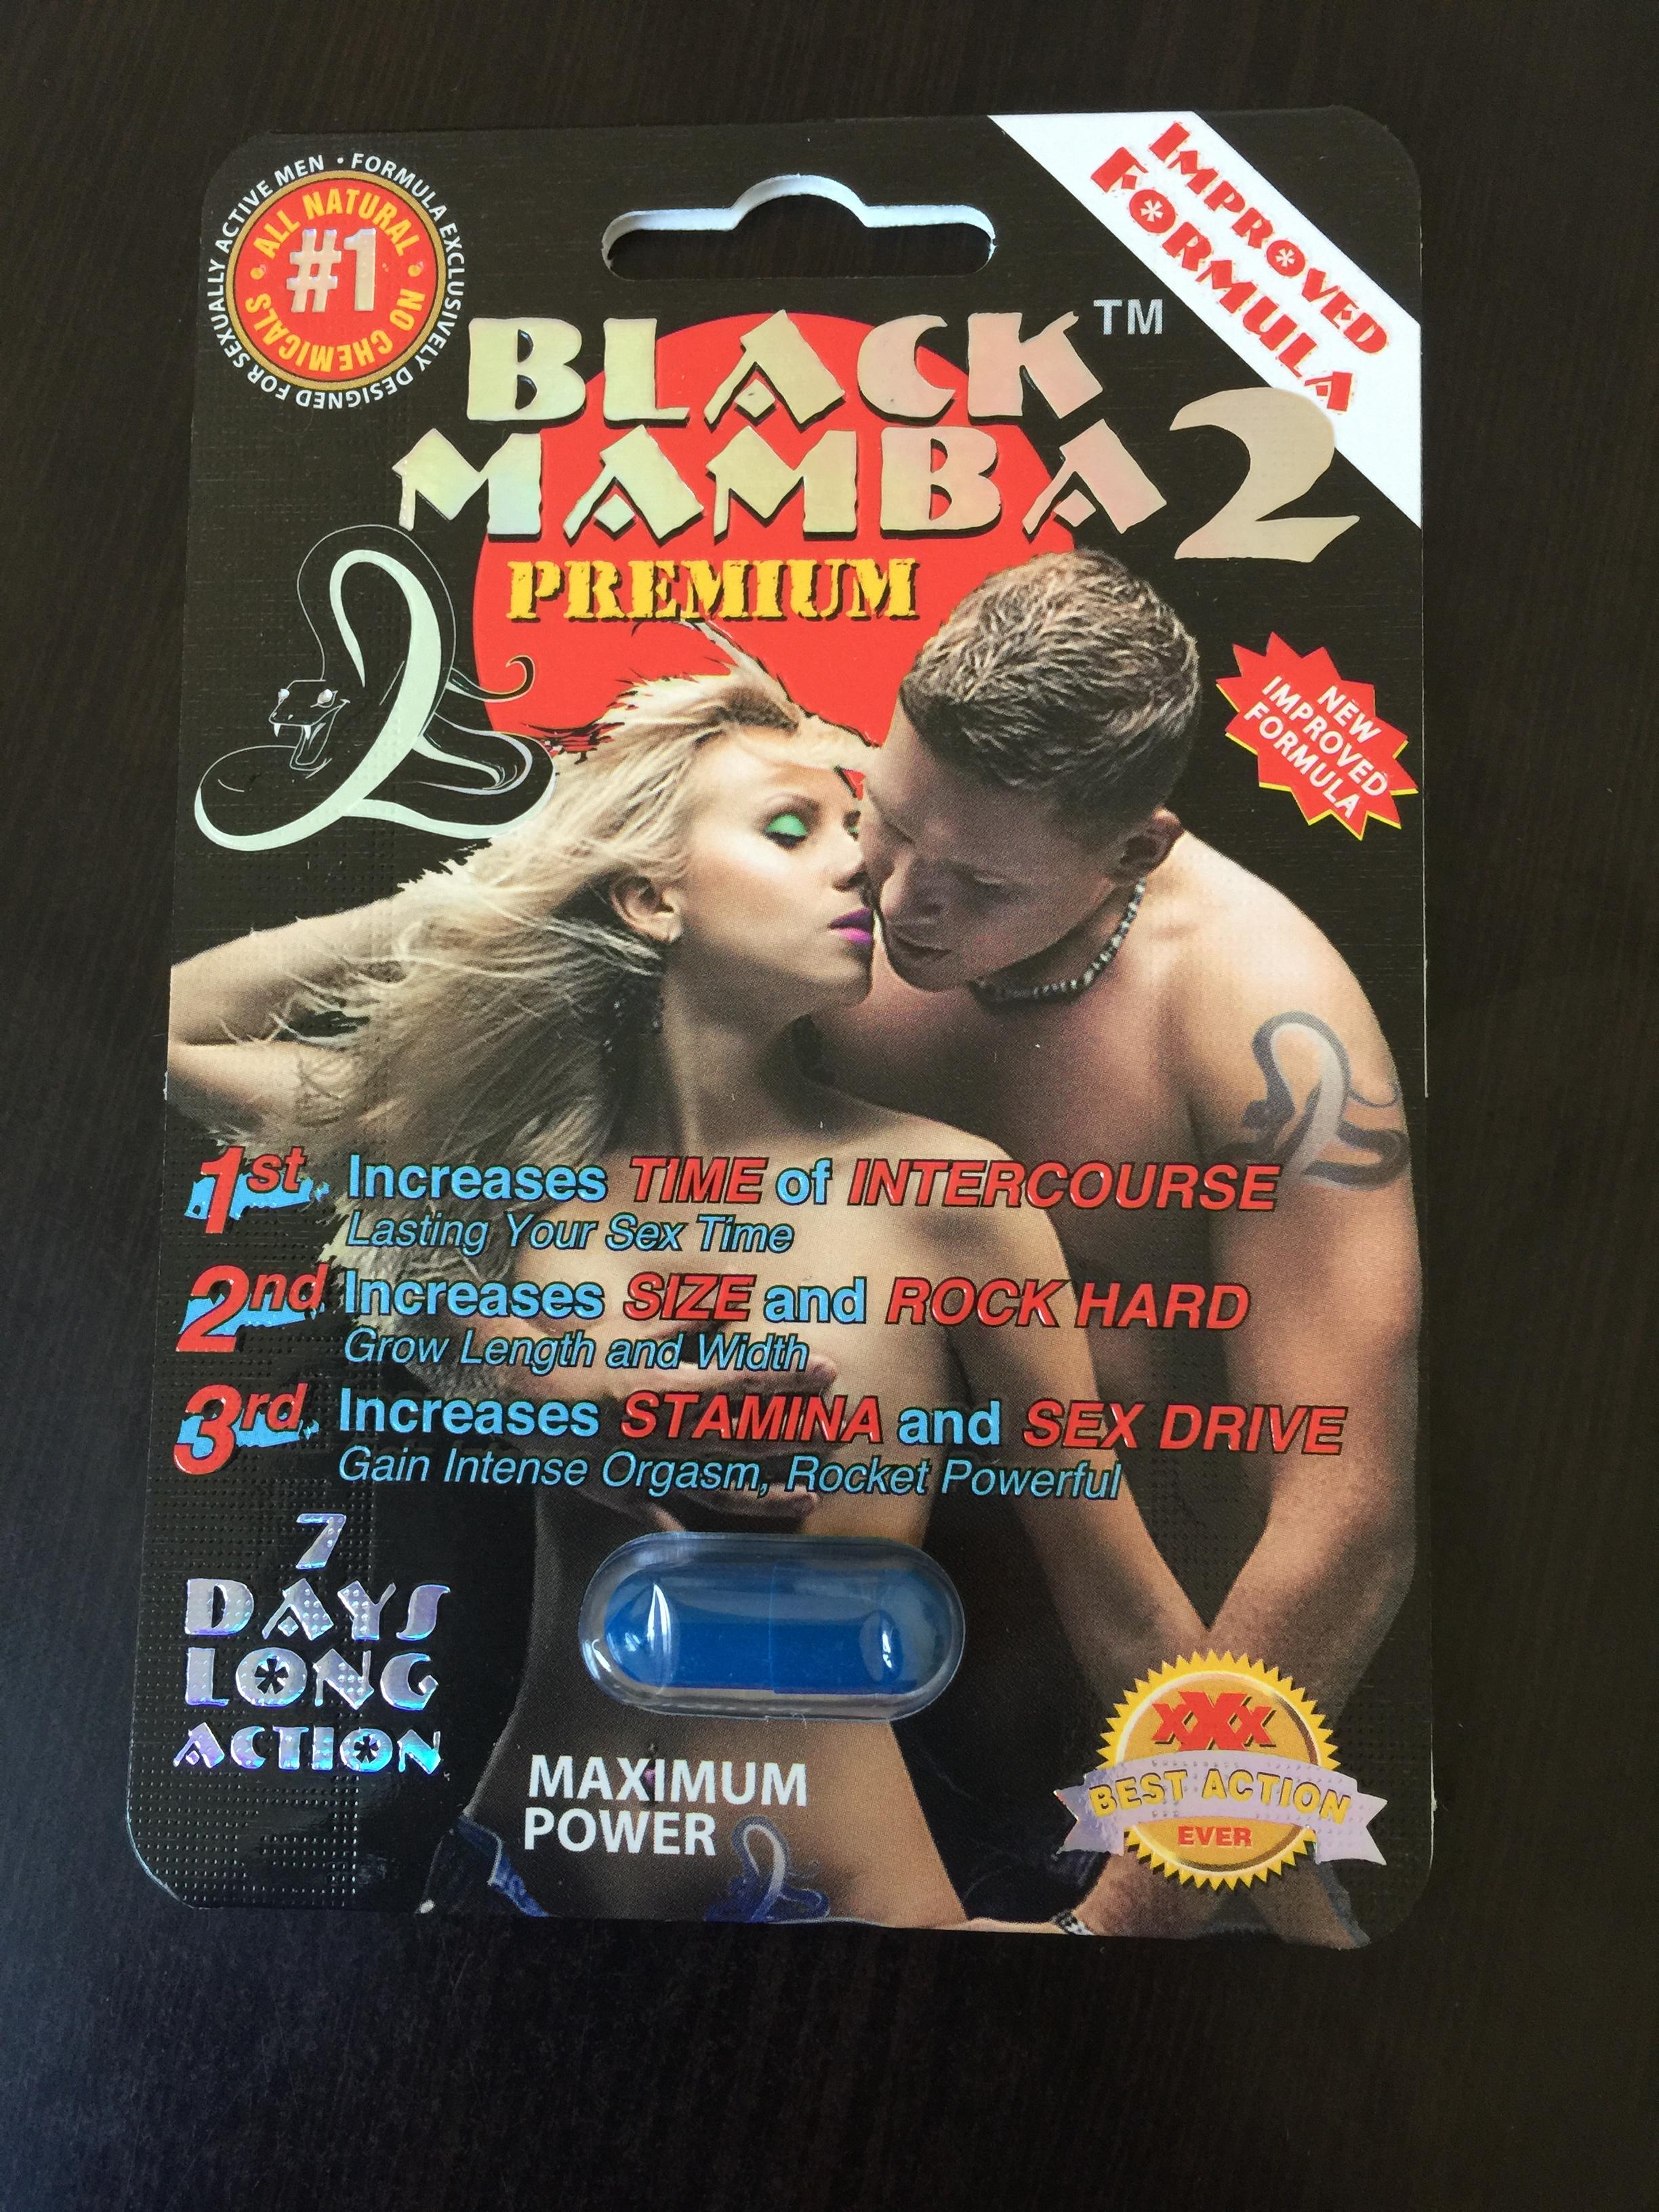 Black Mamba 2 Pros and Cons